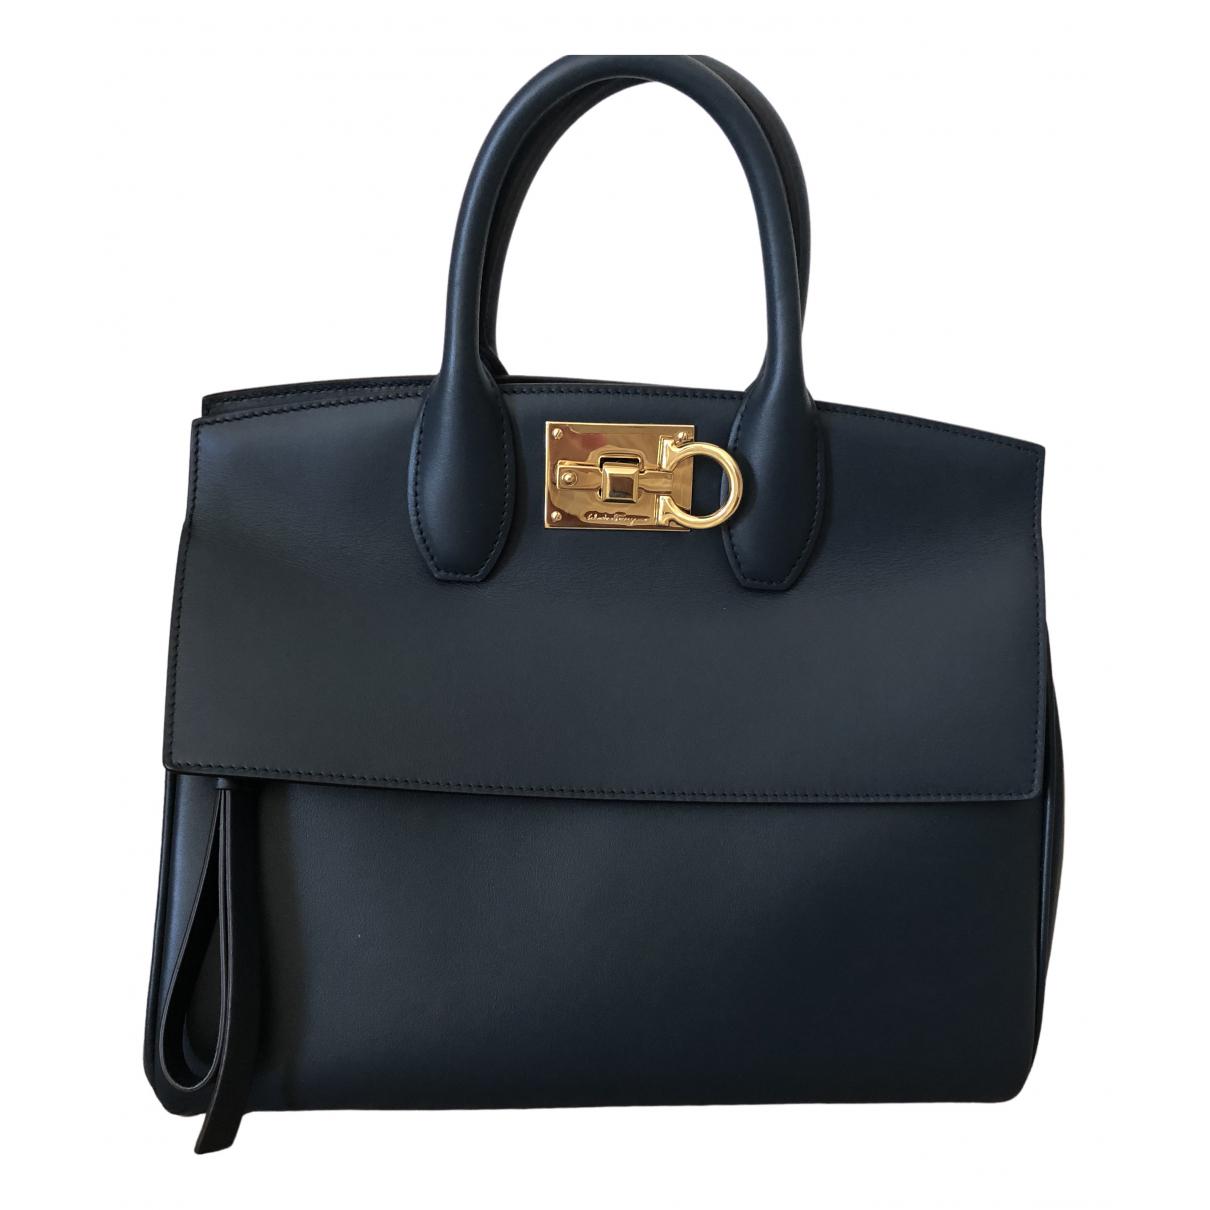 Salvatore Ferragamo \N Blue Leather handbag for Women \N